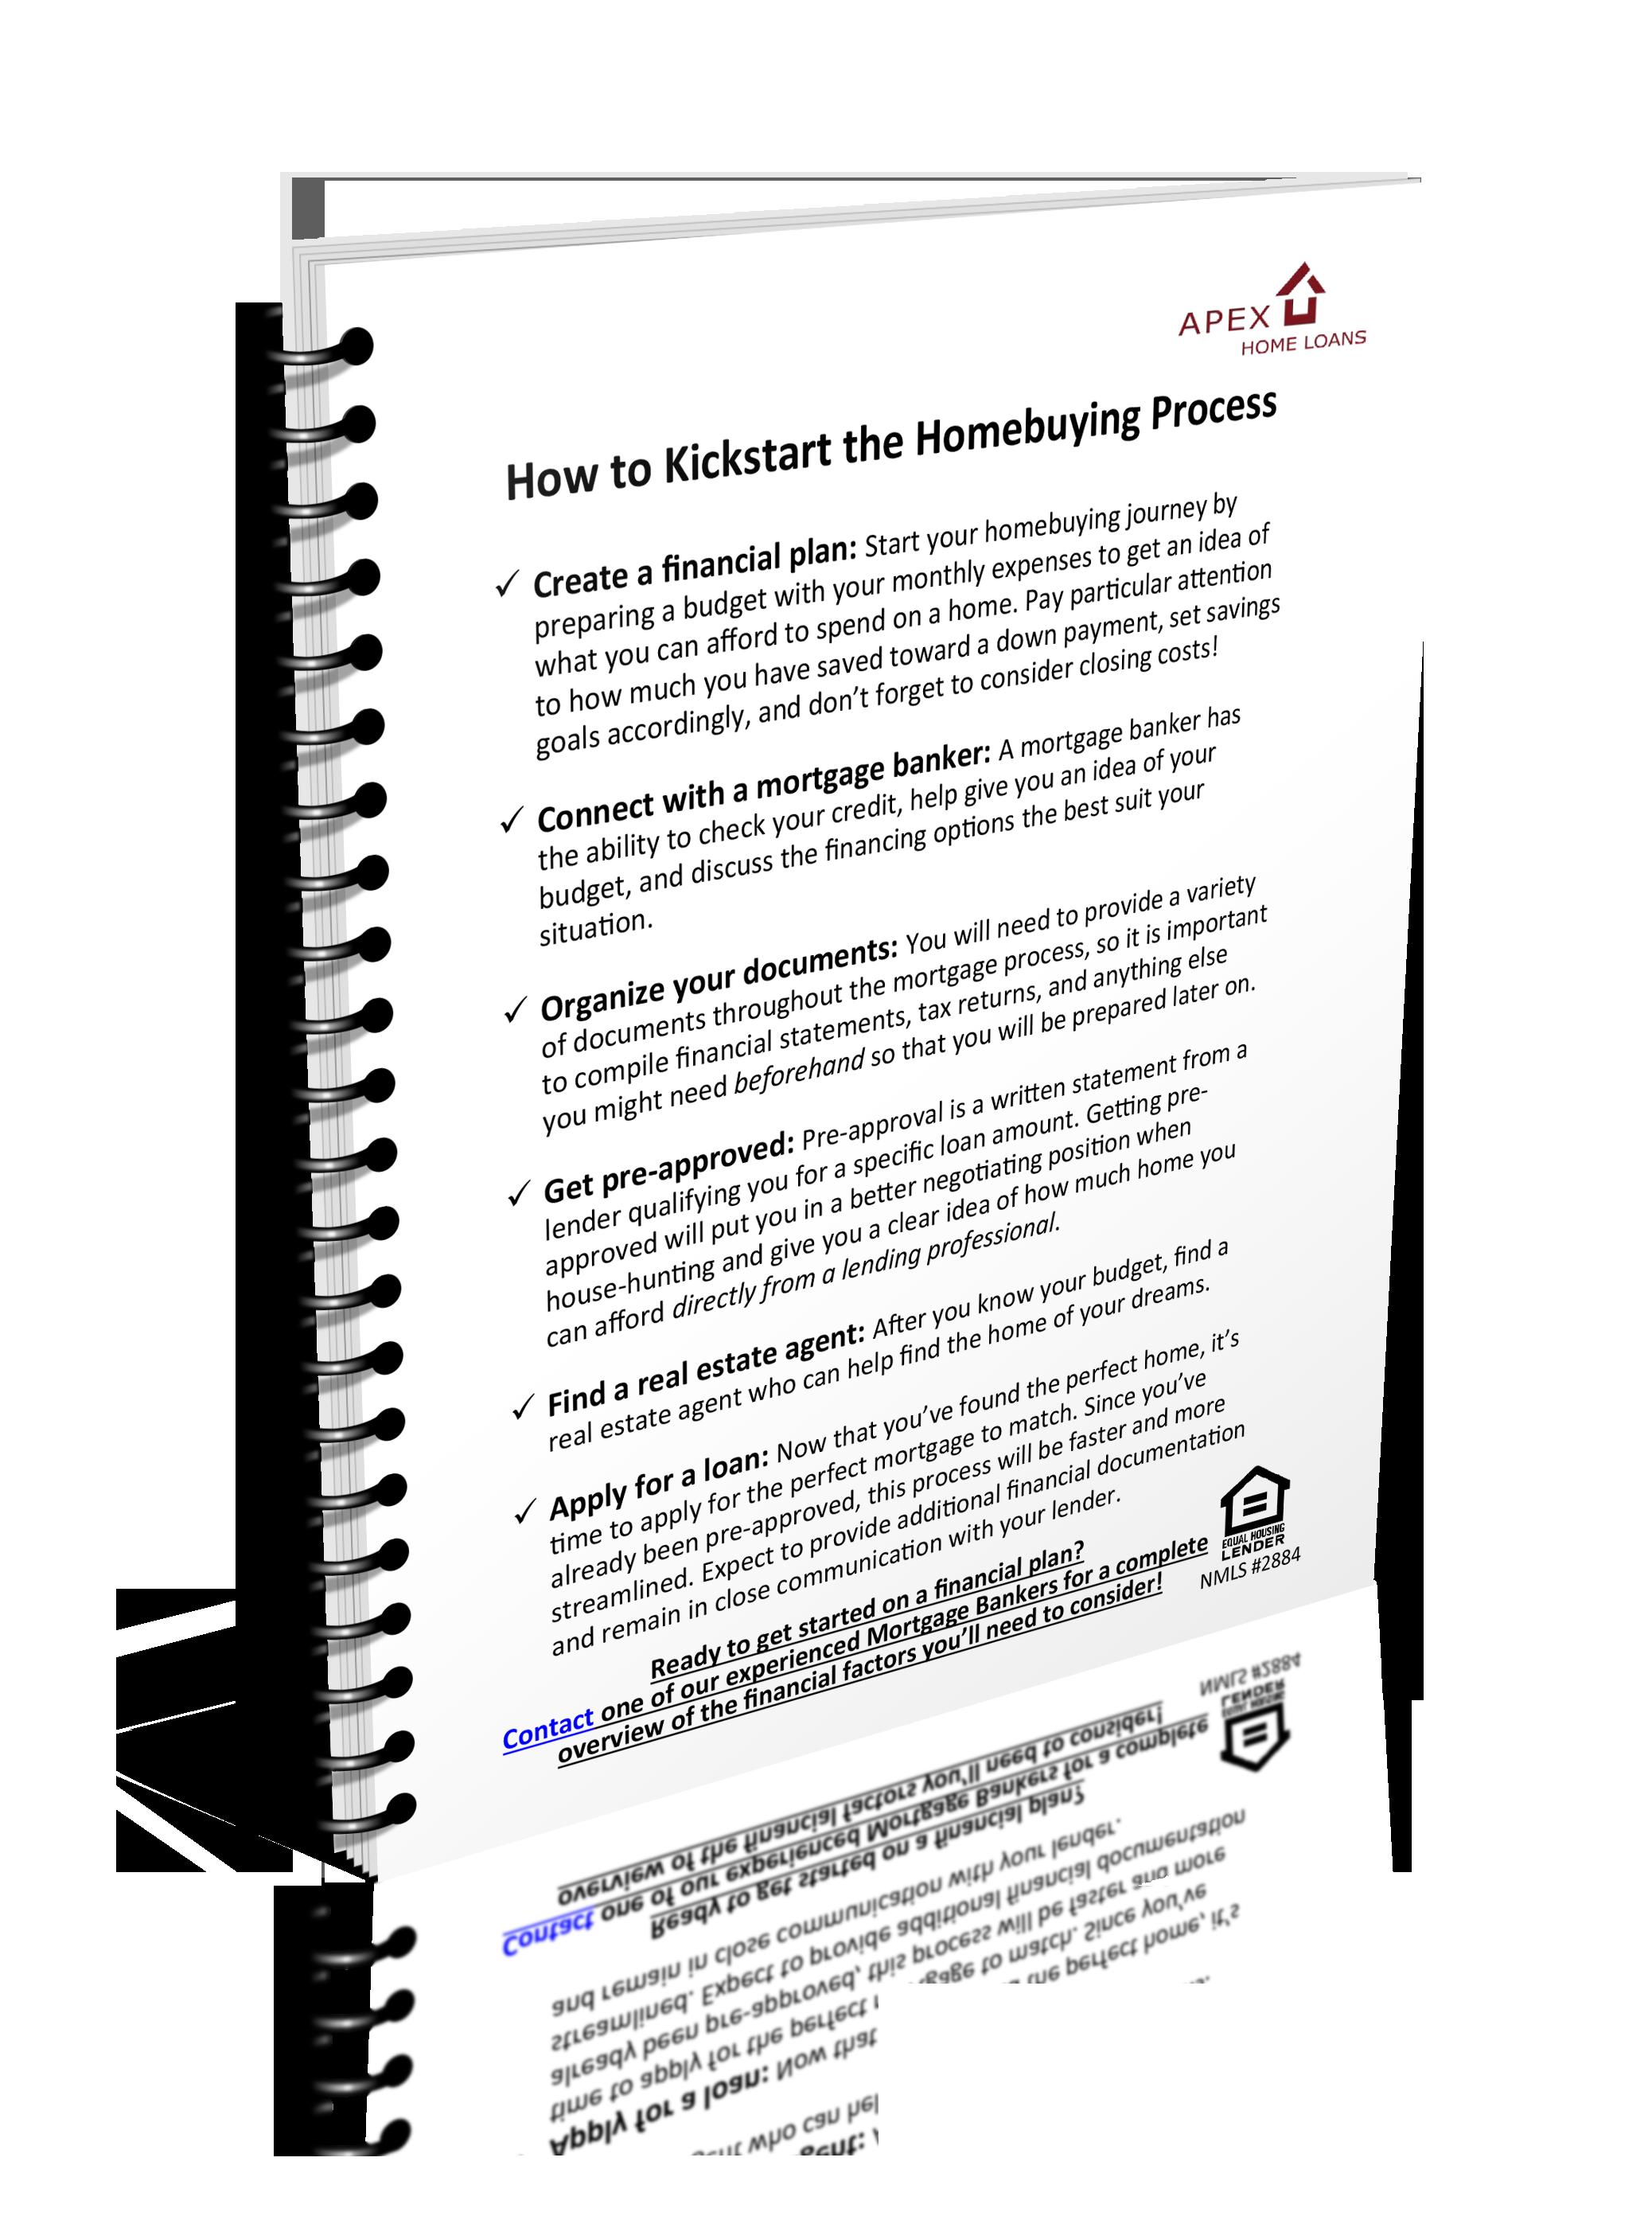 How to Kickstart the Homebuying Process